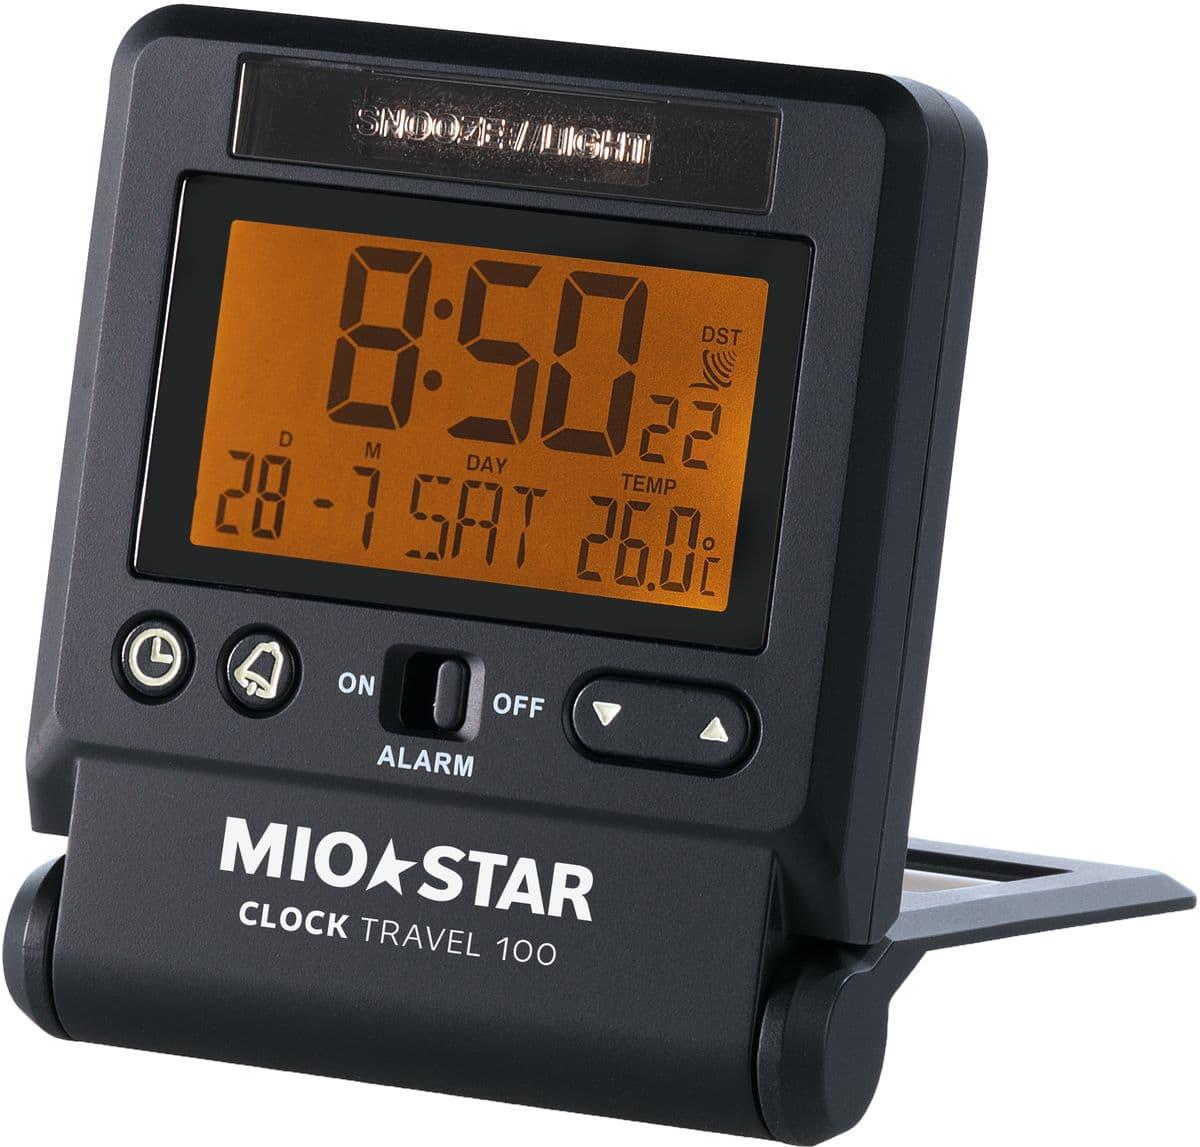 Mio Star Clock Travel 100